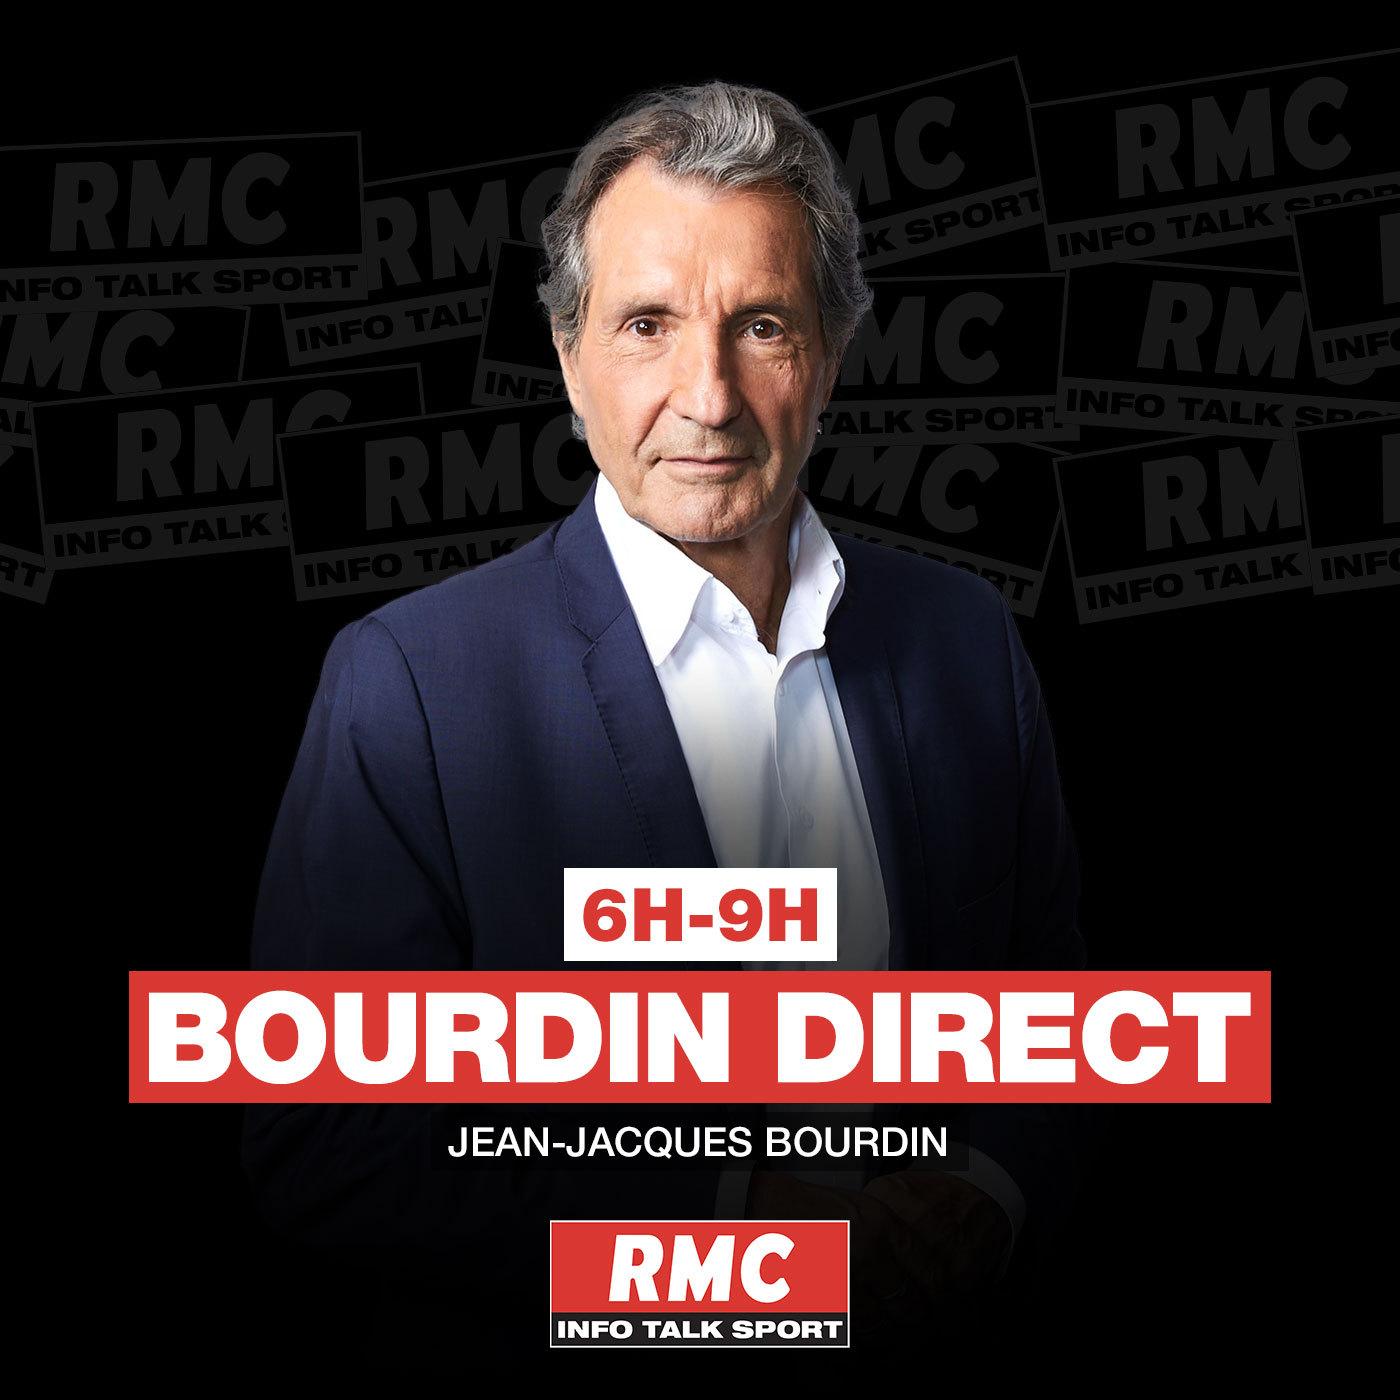 RMC - Bourdin Direct - Jean Jacques Bourdin